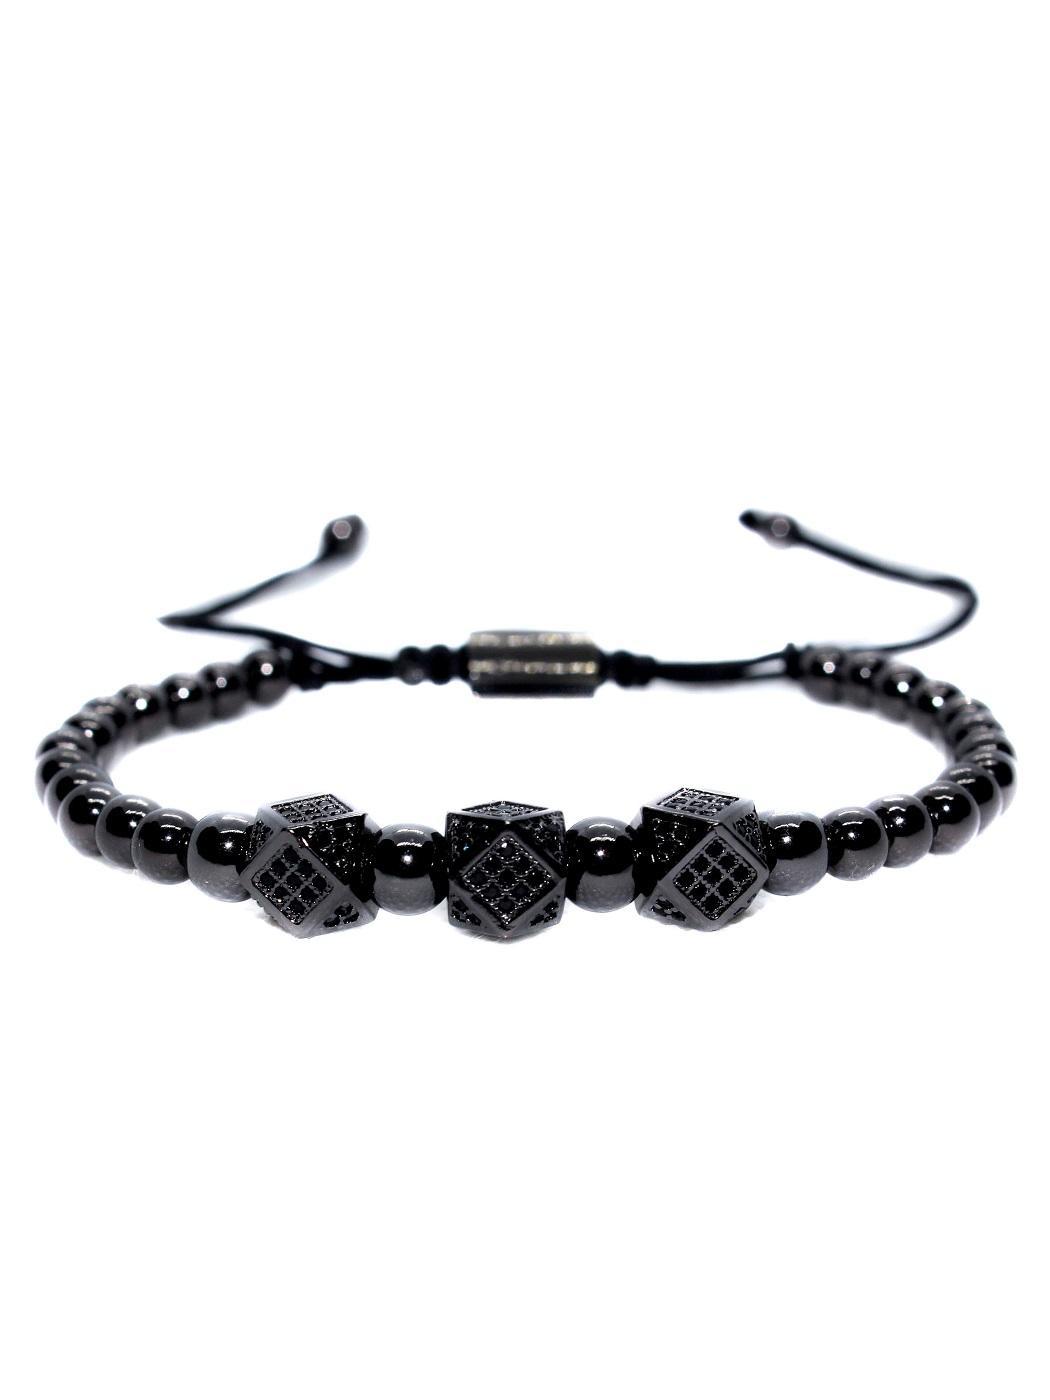 Mens Bracelets Online, Mens Diamond Bracelet, Mens Diamond Bracelet Cheap, Mens Diamond Bracelet On Wrist, Mens Diamond Bracelet Sale, Mens Diamond Jewelry For Cheap, Mens Jewelry Online, My King My Queen Bracelets